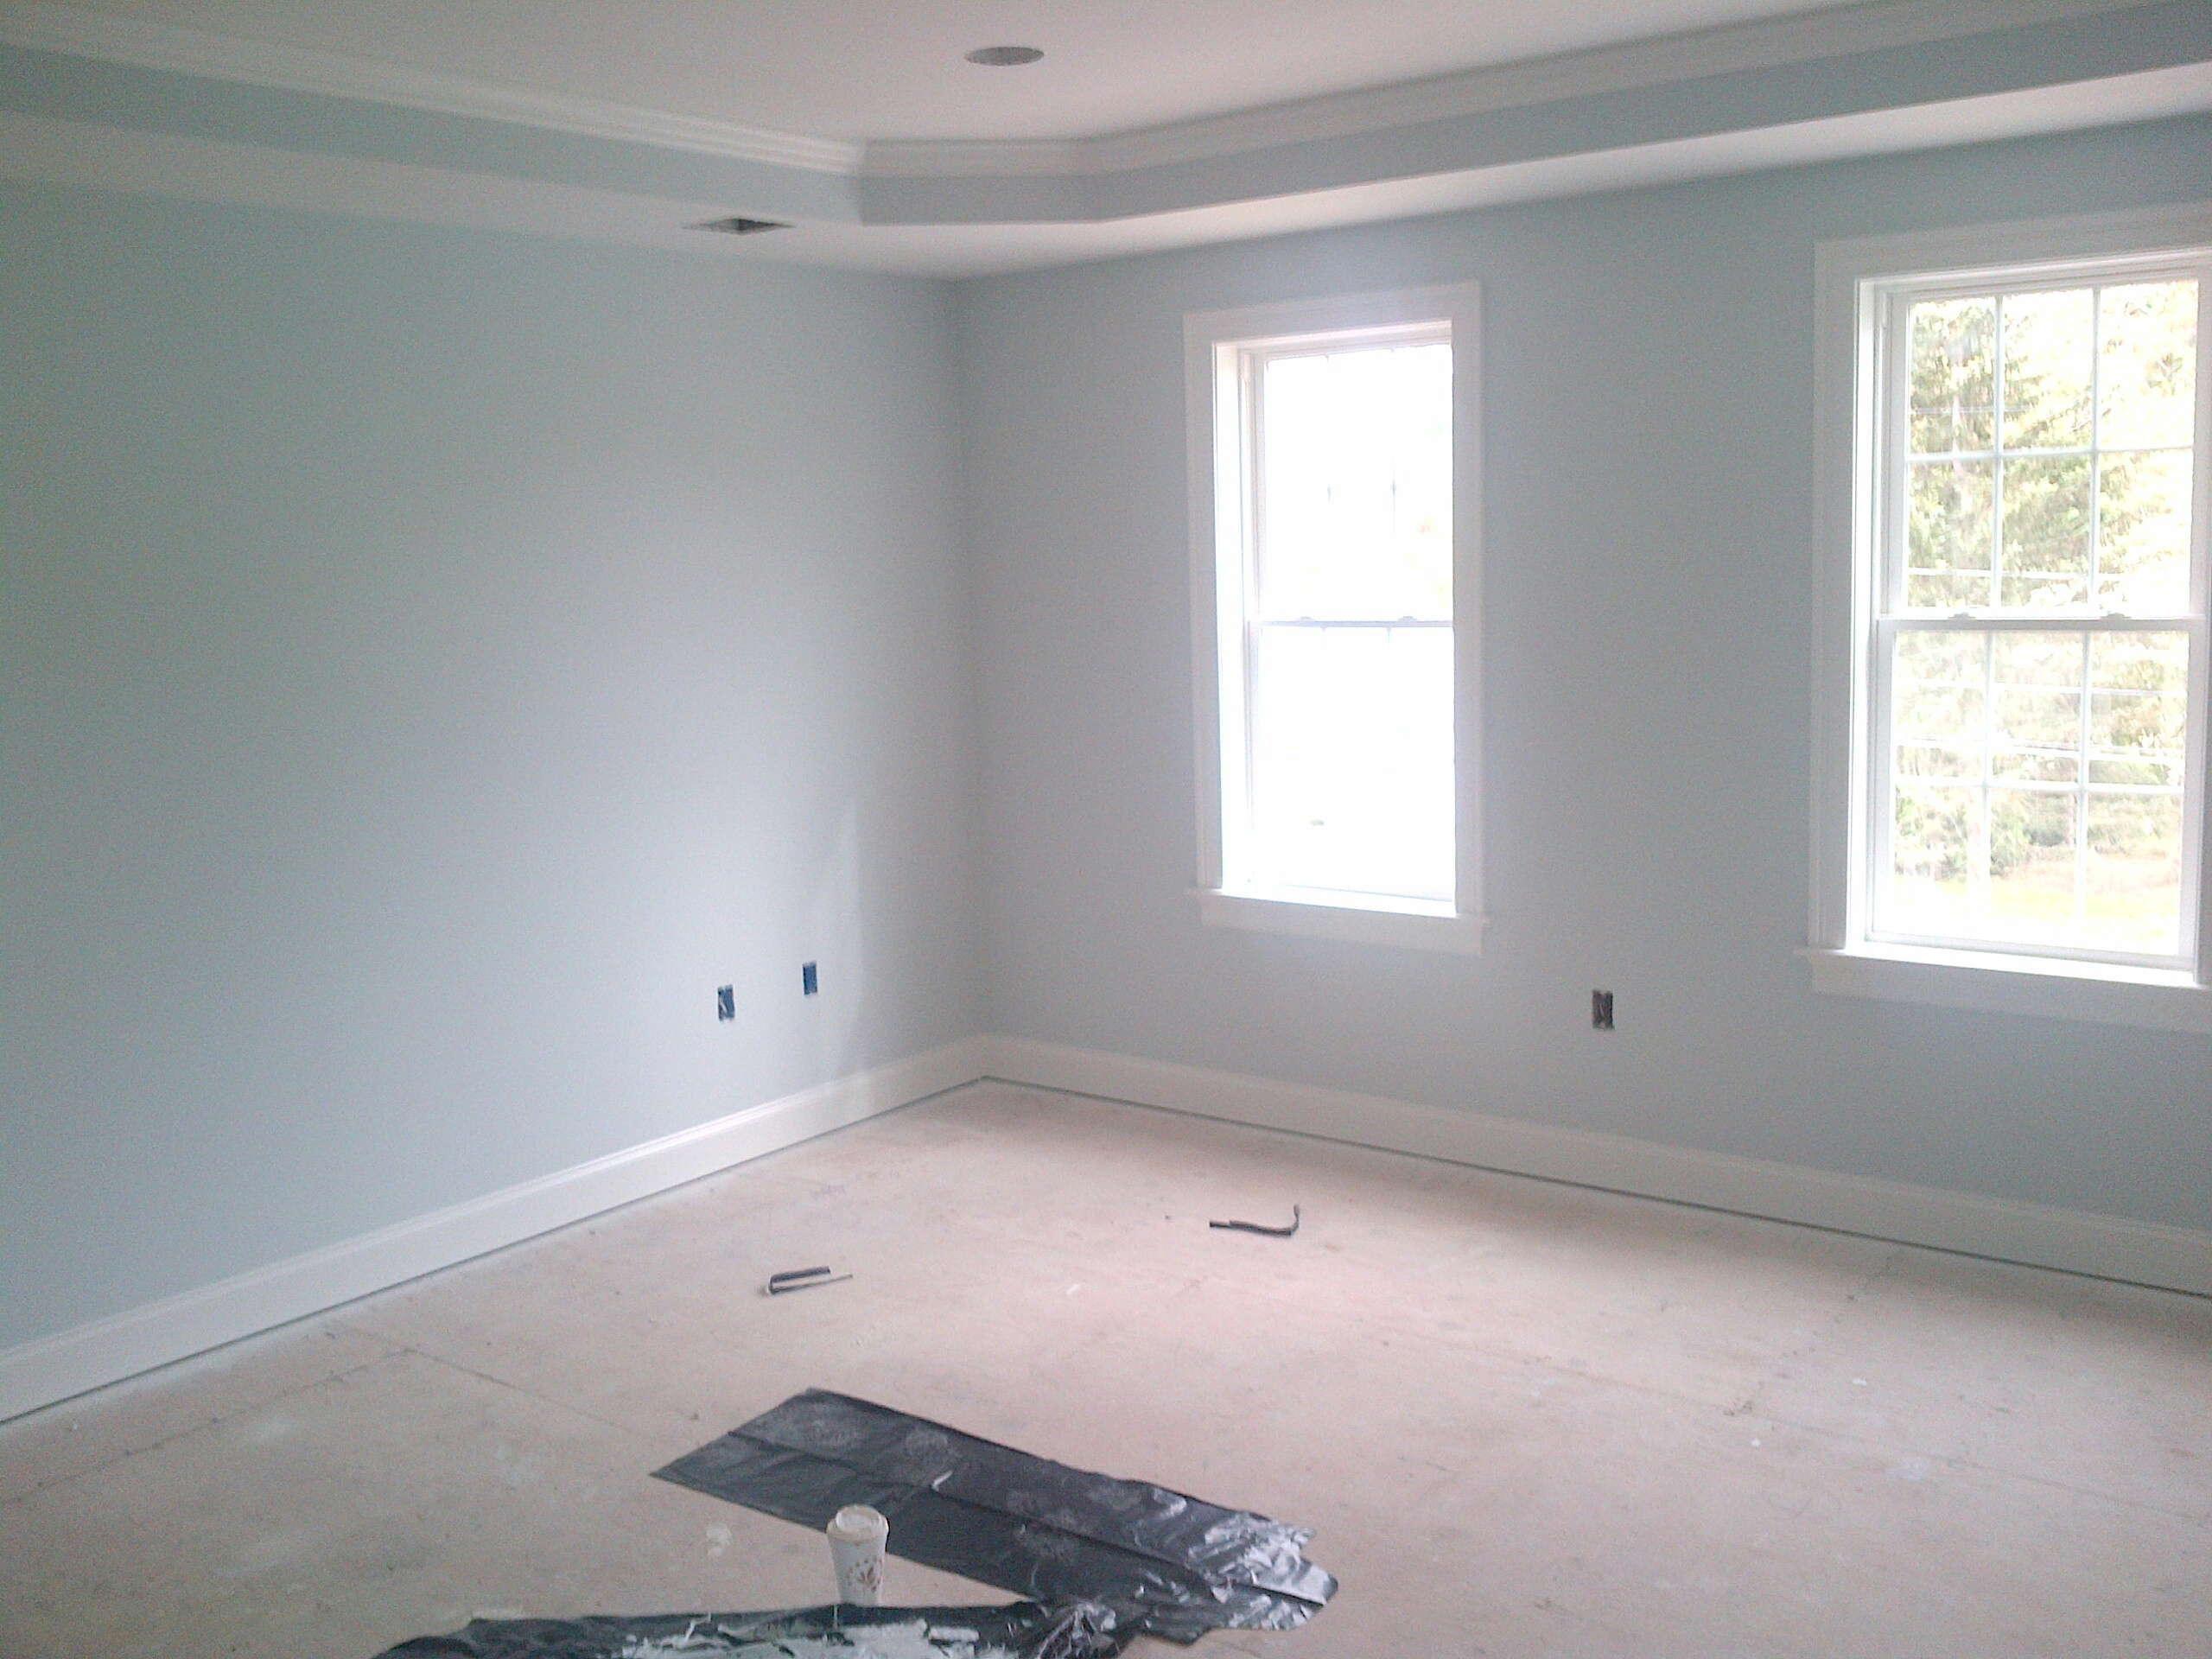 Benjamin Moore Glass Slipper Grey Painted Walls Paint Colors